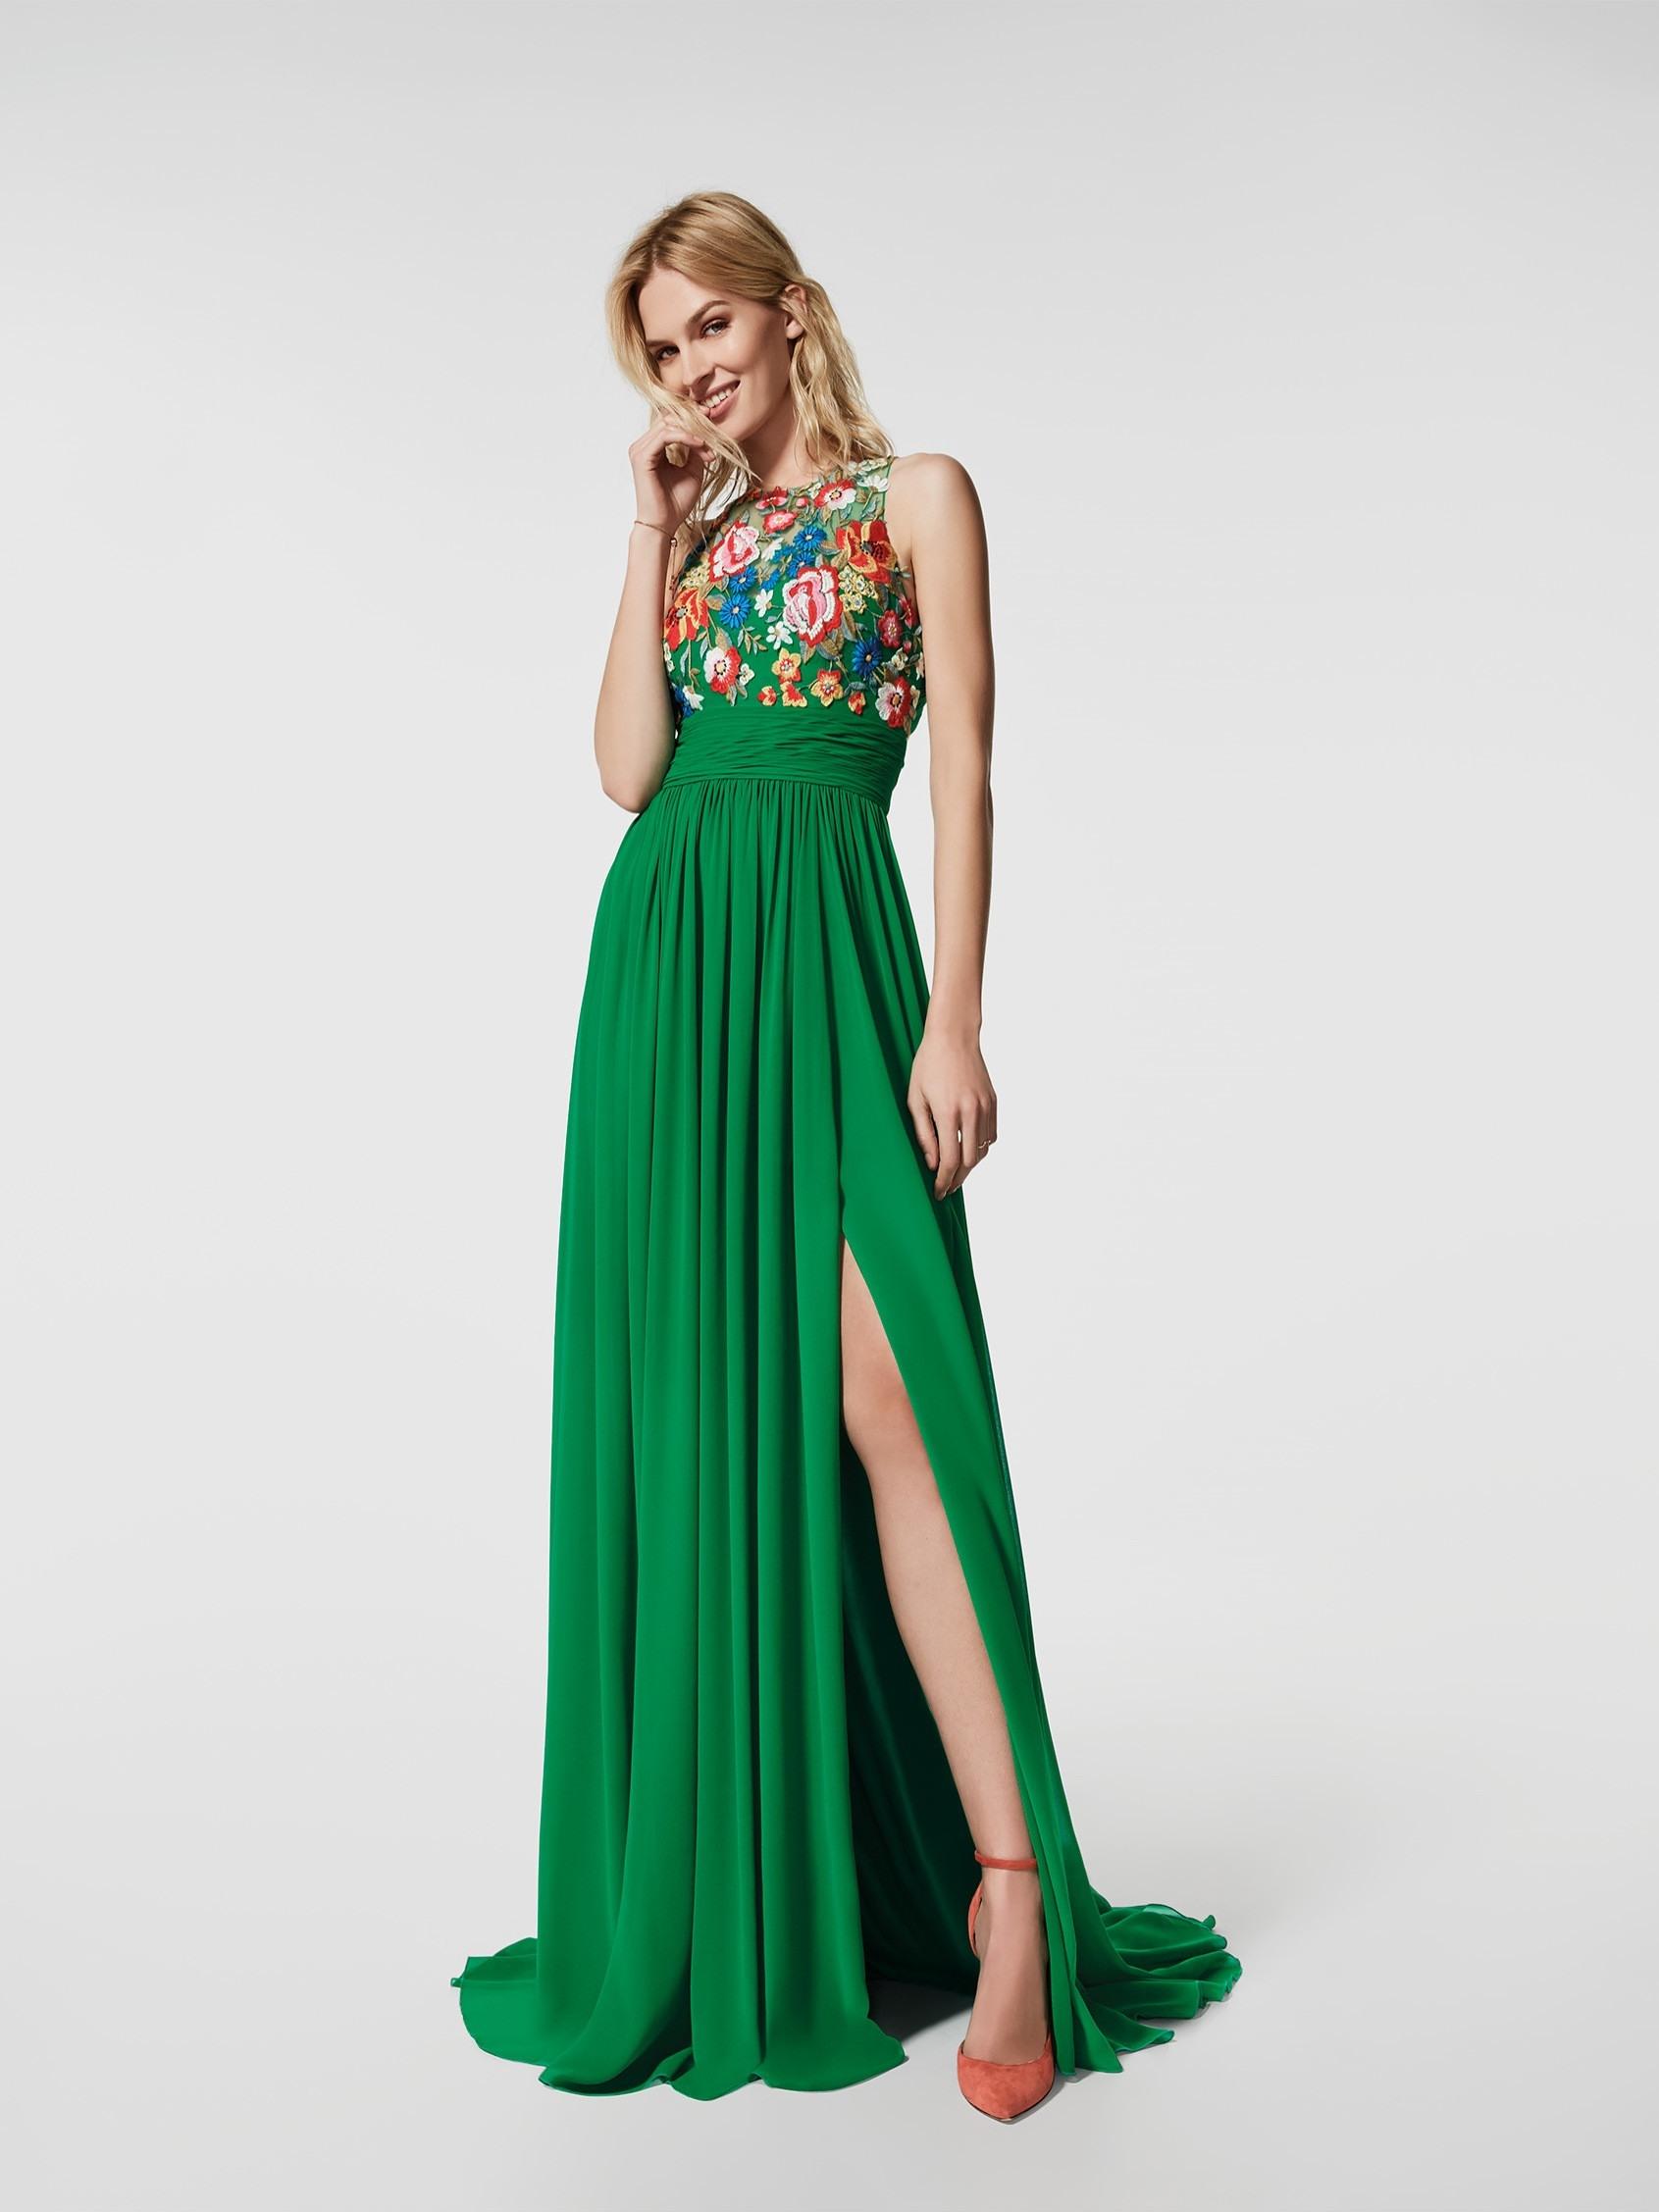 13 Leicht Grünes Abendkleid GalerieDesigner Großartig Grünes Abendkleid Ärmel